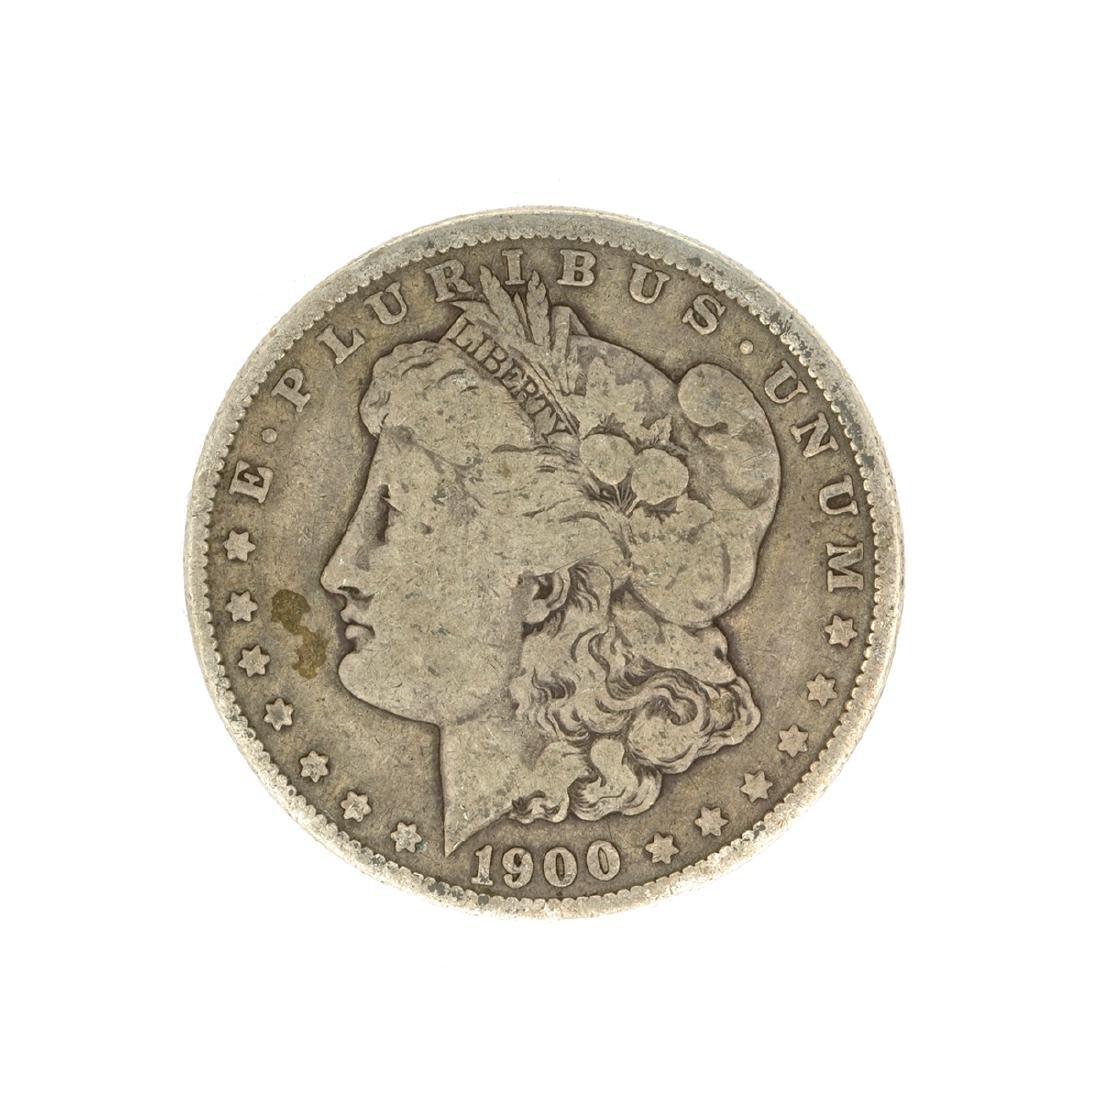 Rare 1900-O U.S. Morgan Silver Dollar